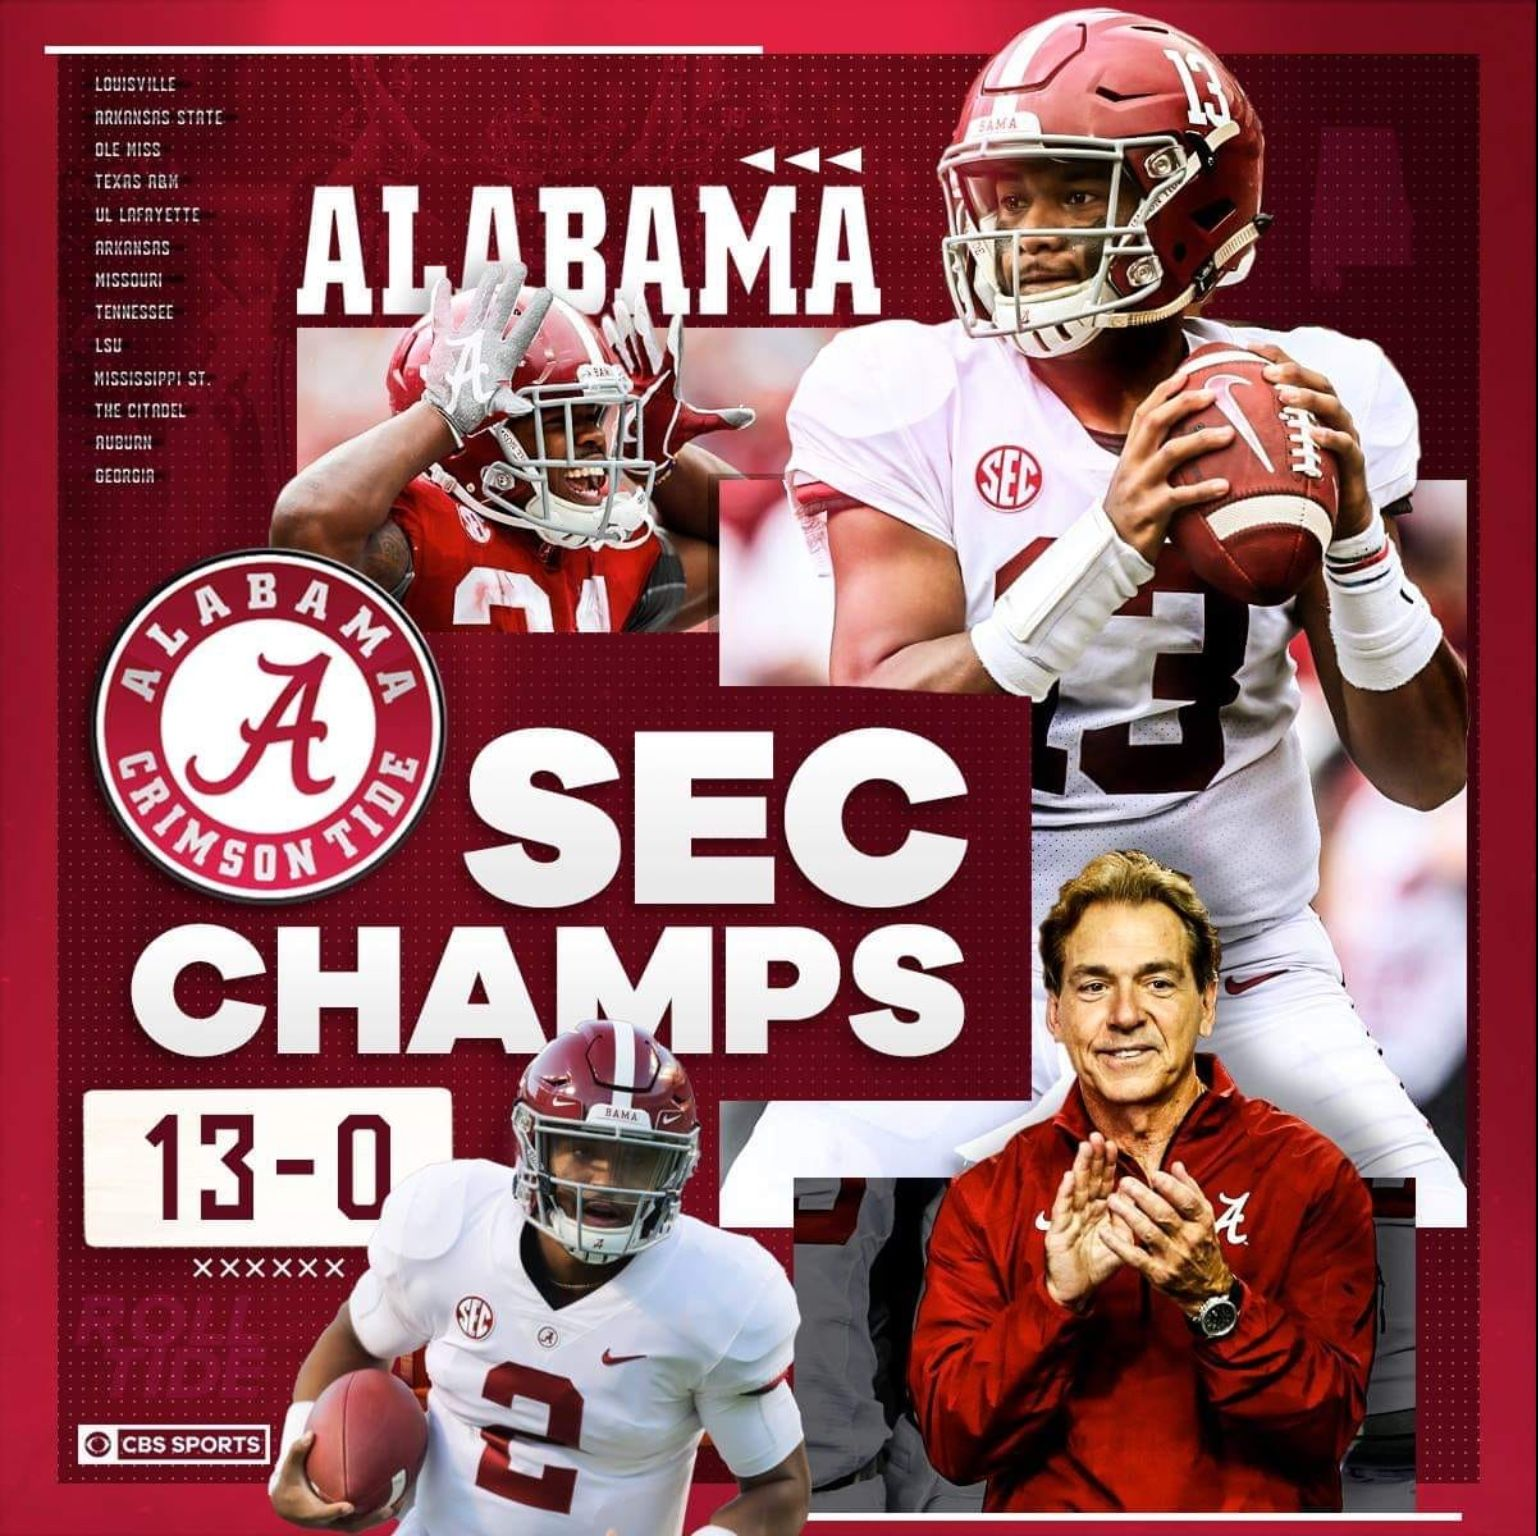 Alabama Roll Tides 2018 Champs Alabama crimson tide